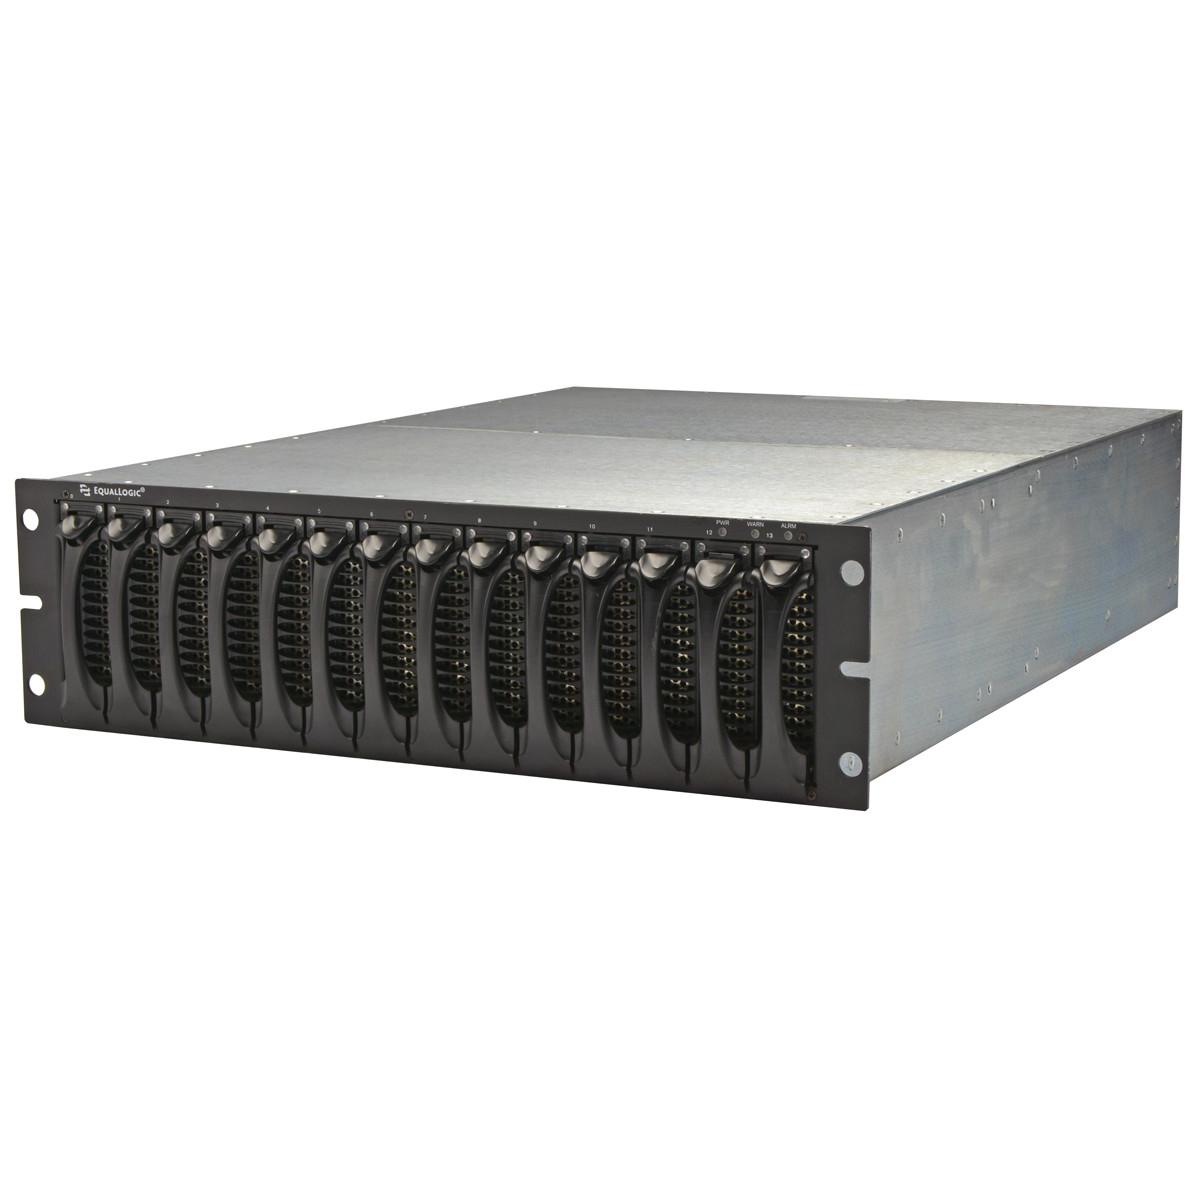 PS300E Dell EqualLogic Storage Array